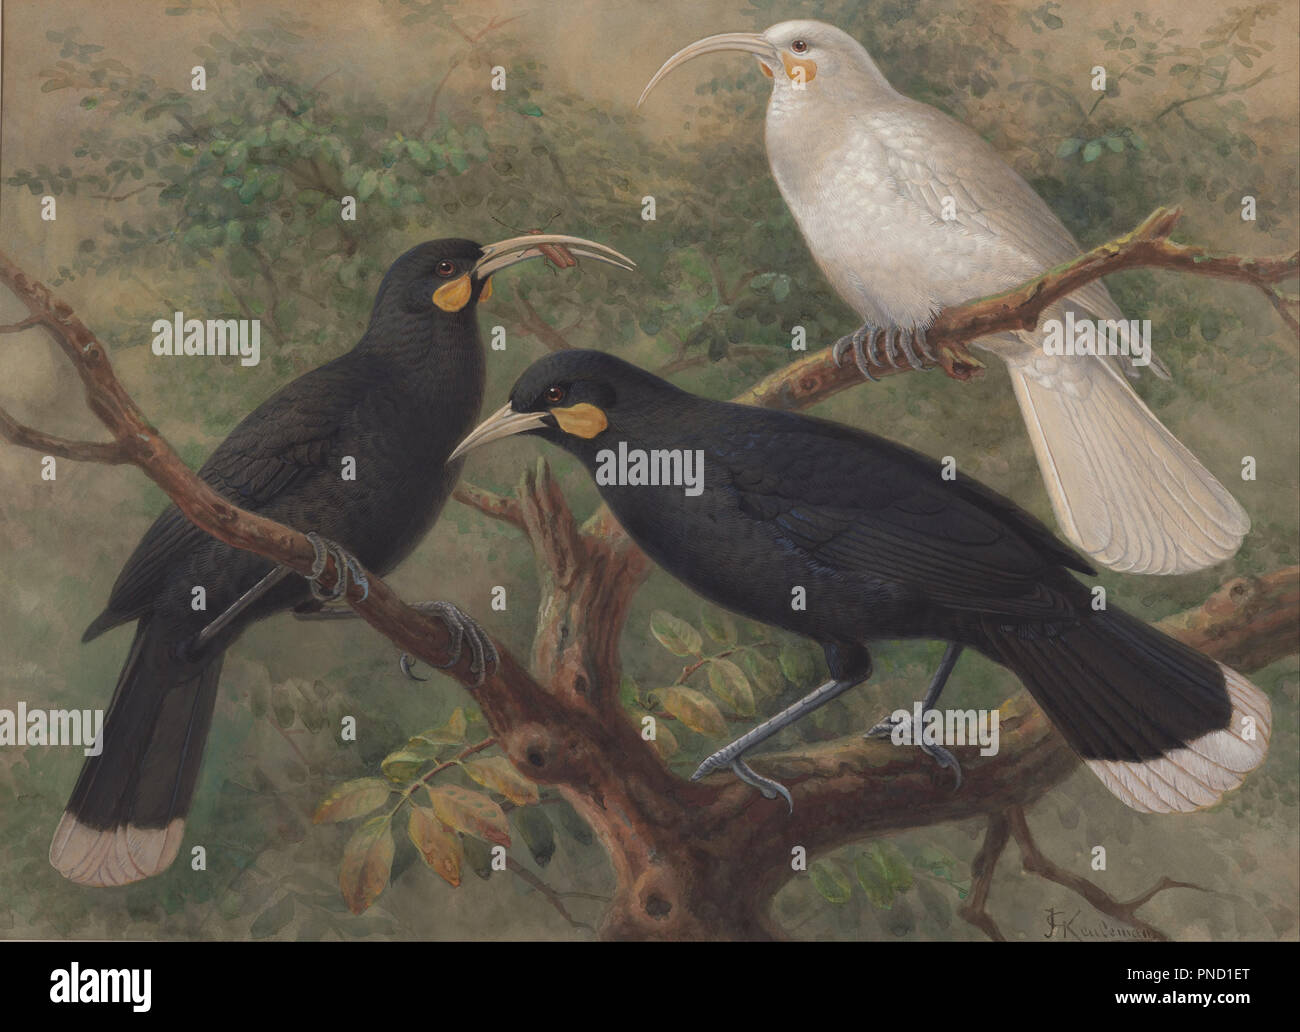 Three Huia (Heteralocha acutirostris). Date/Period: Ca. 1900. Watercolours. Watercolour and gouache. Height: 529 mm (20.82 in); Width: 724 mm (28.50 in). Author: John Gerrard Keulemans. Stock Photo